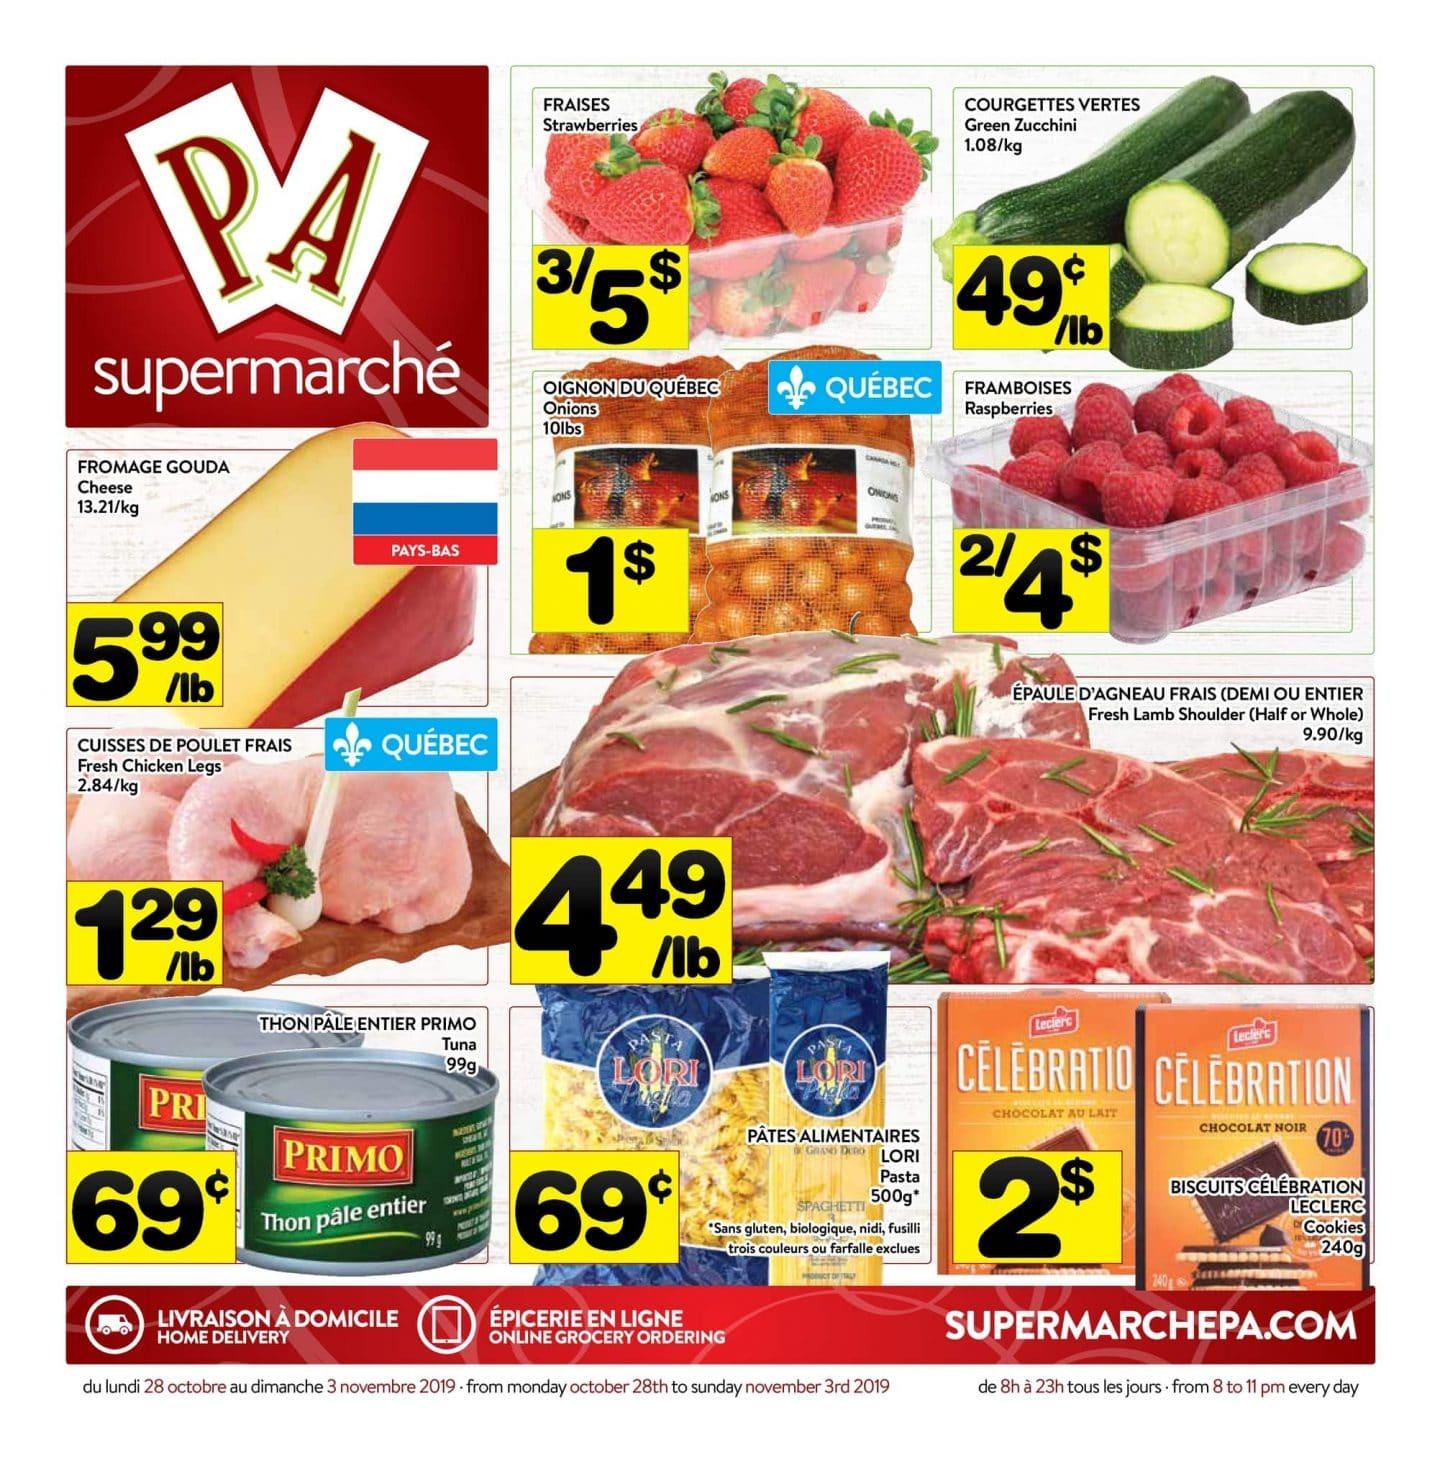 Circulaire Supermarché PA 28 octobre – 2 novembre 2019